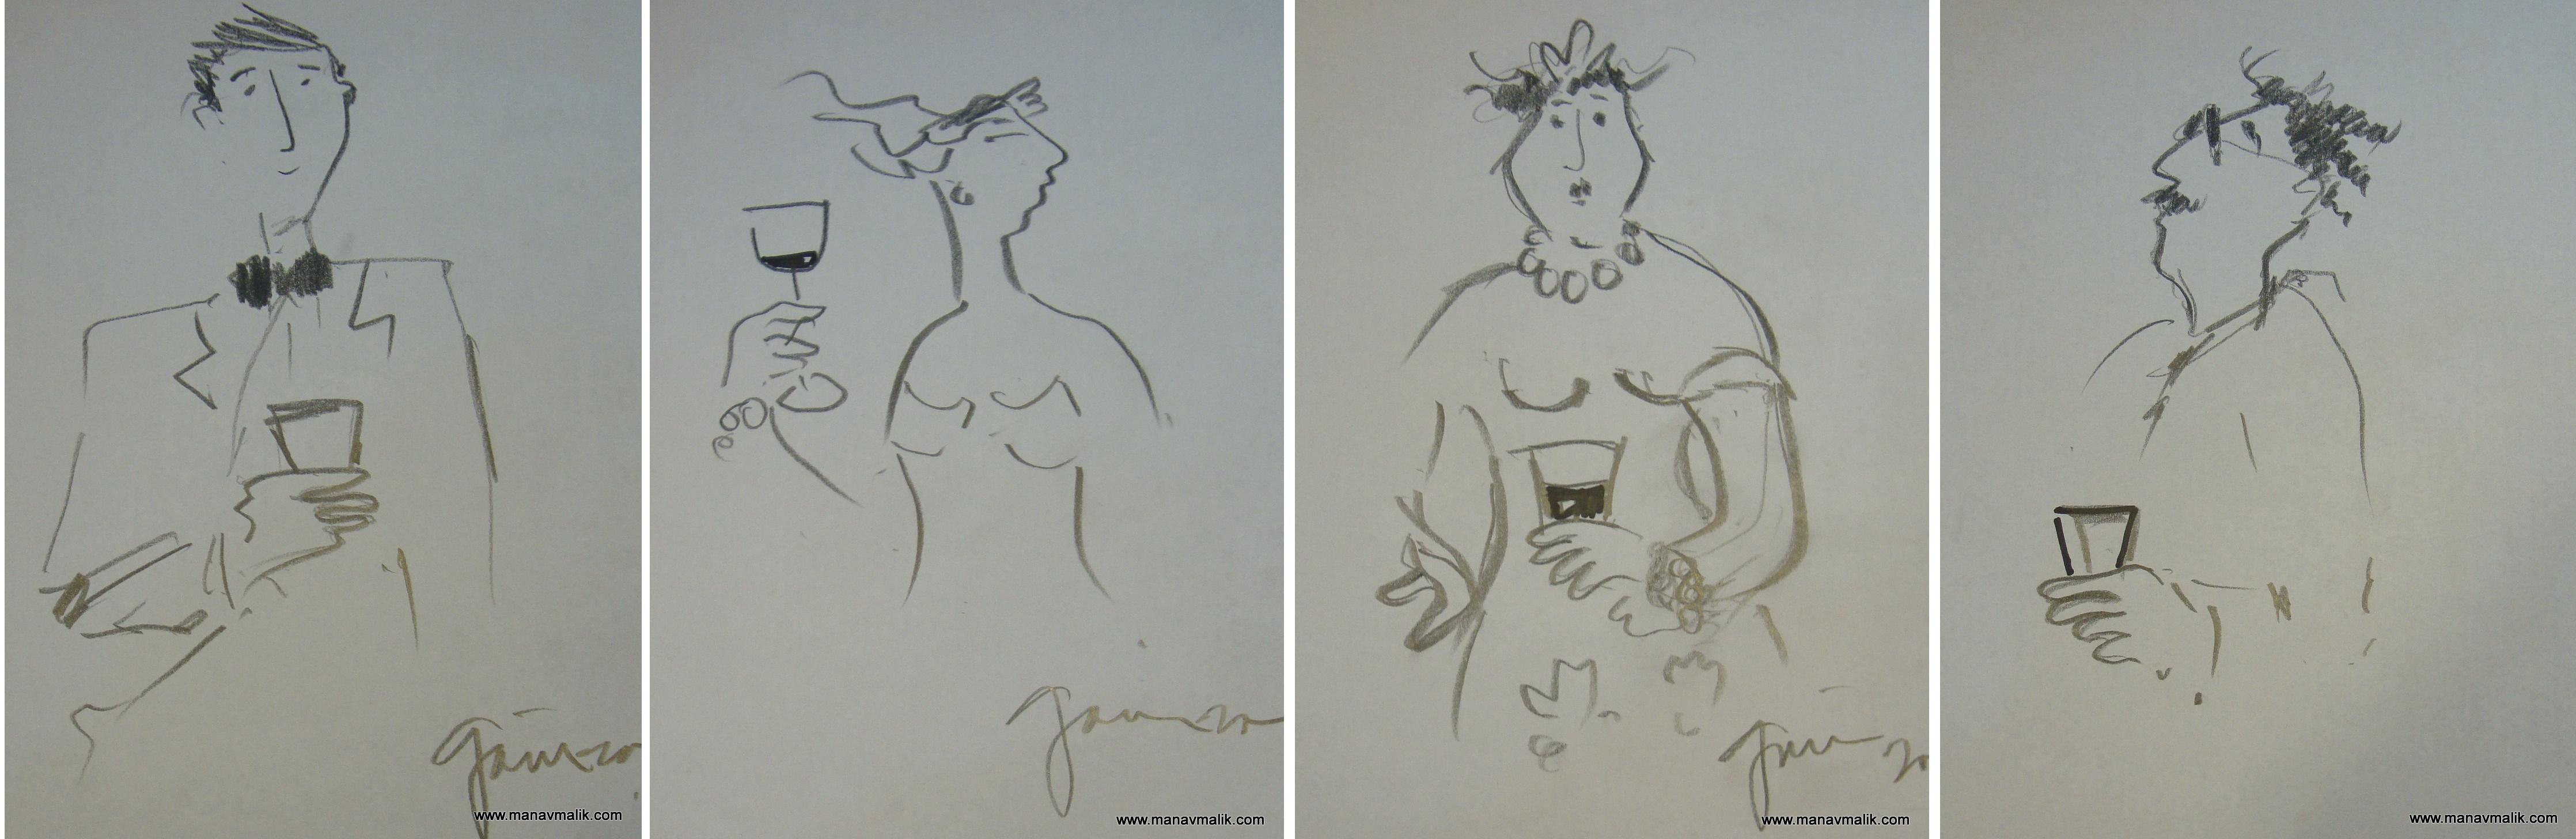 Agustin Gainza Rough sketch BW